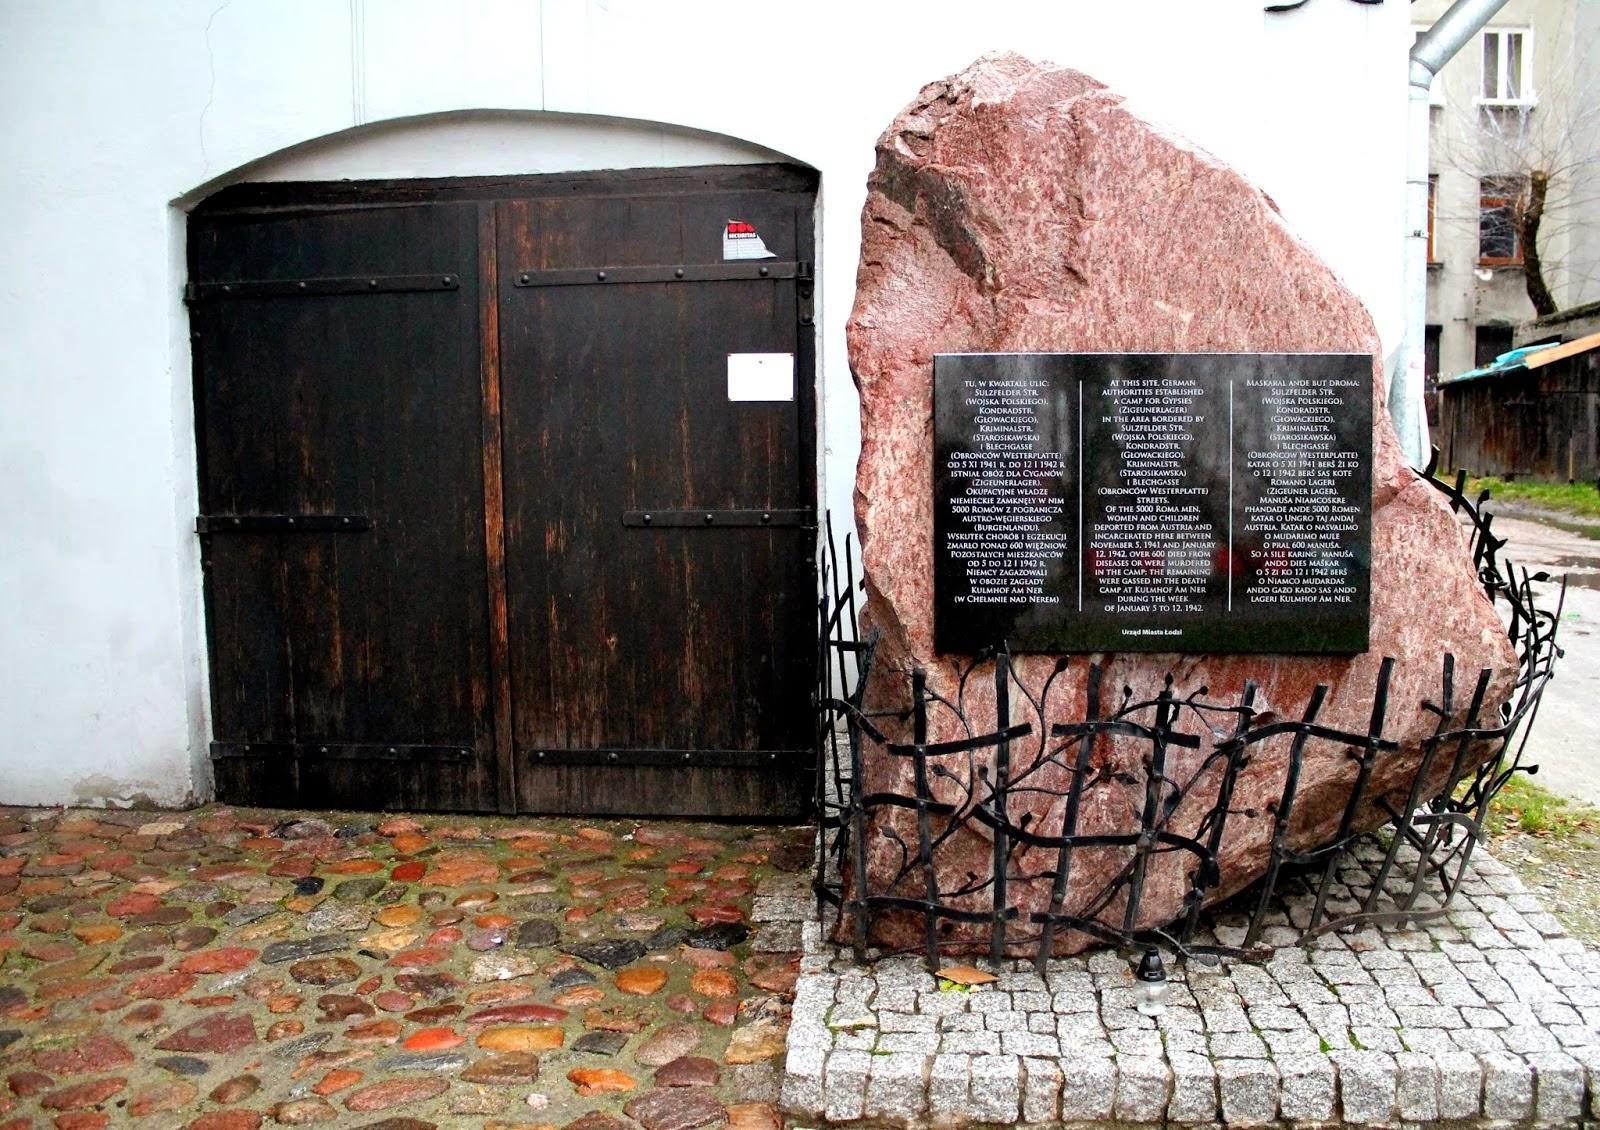 http://baedekerlodz.blogspot.com/2013/11/litzmannstadt-getto-oboz-cyganski.html